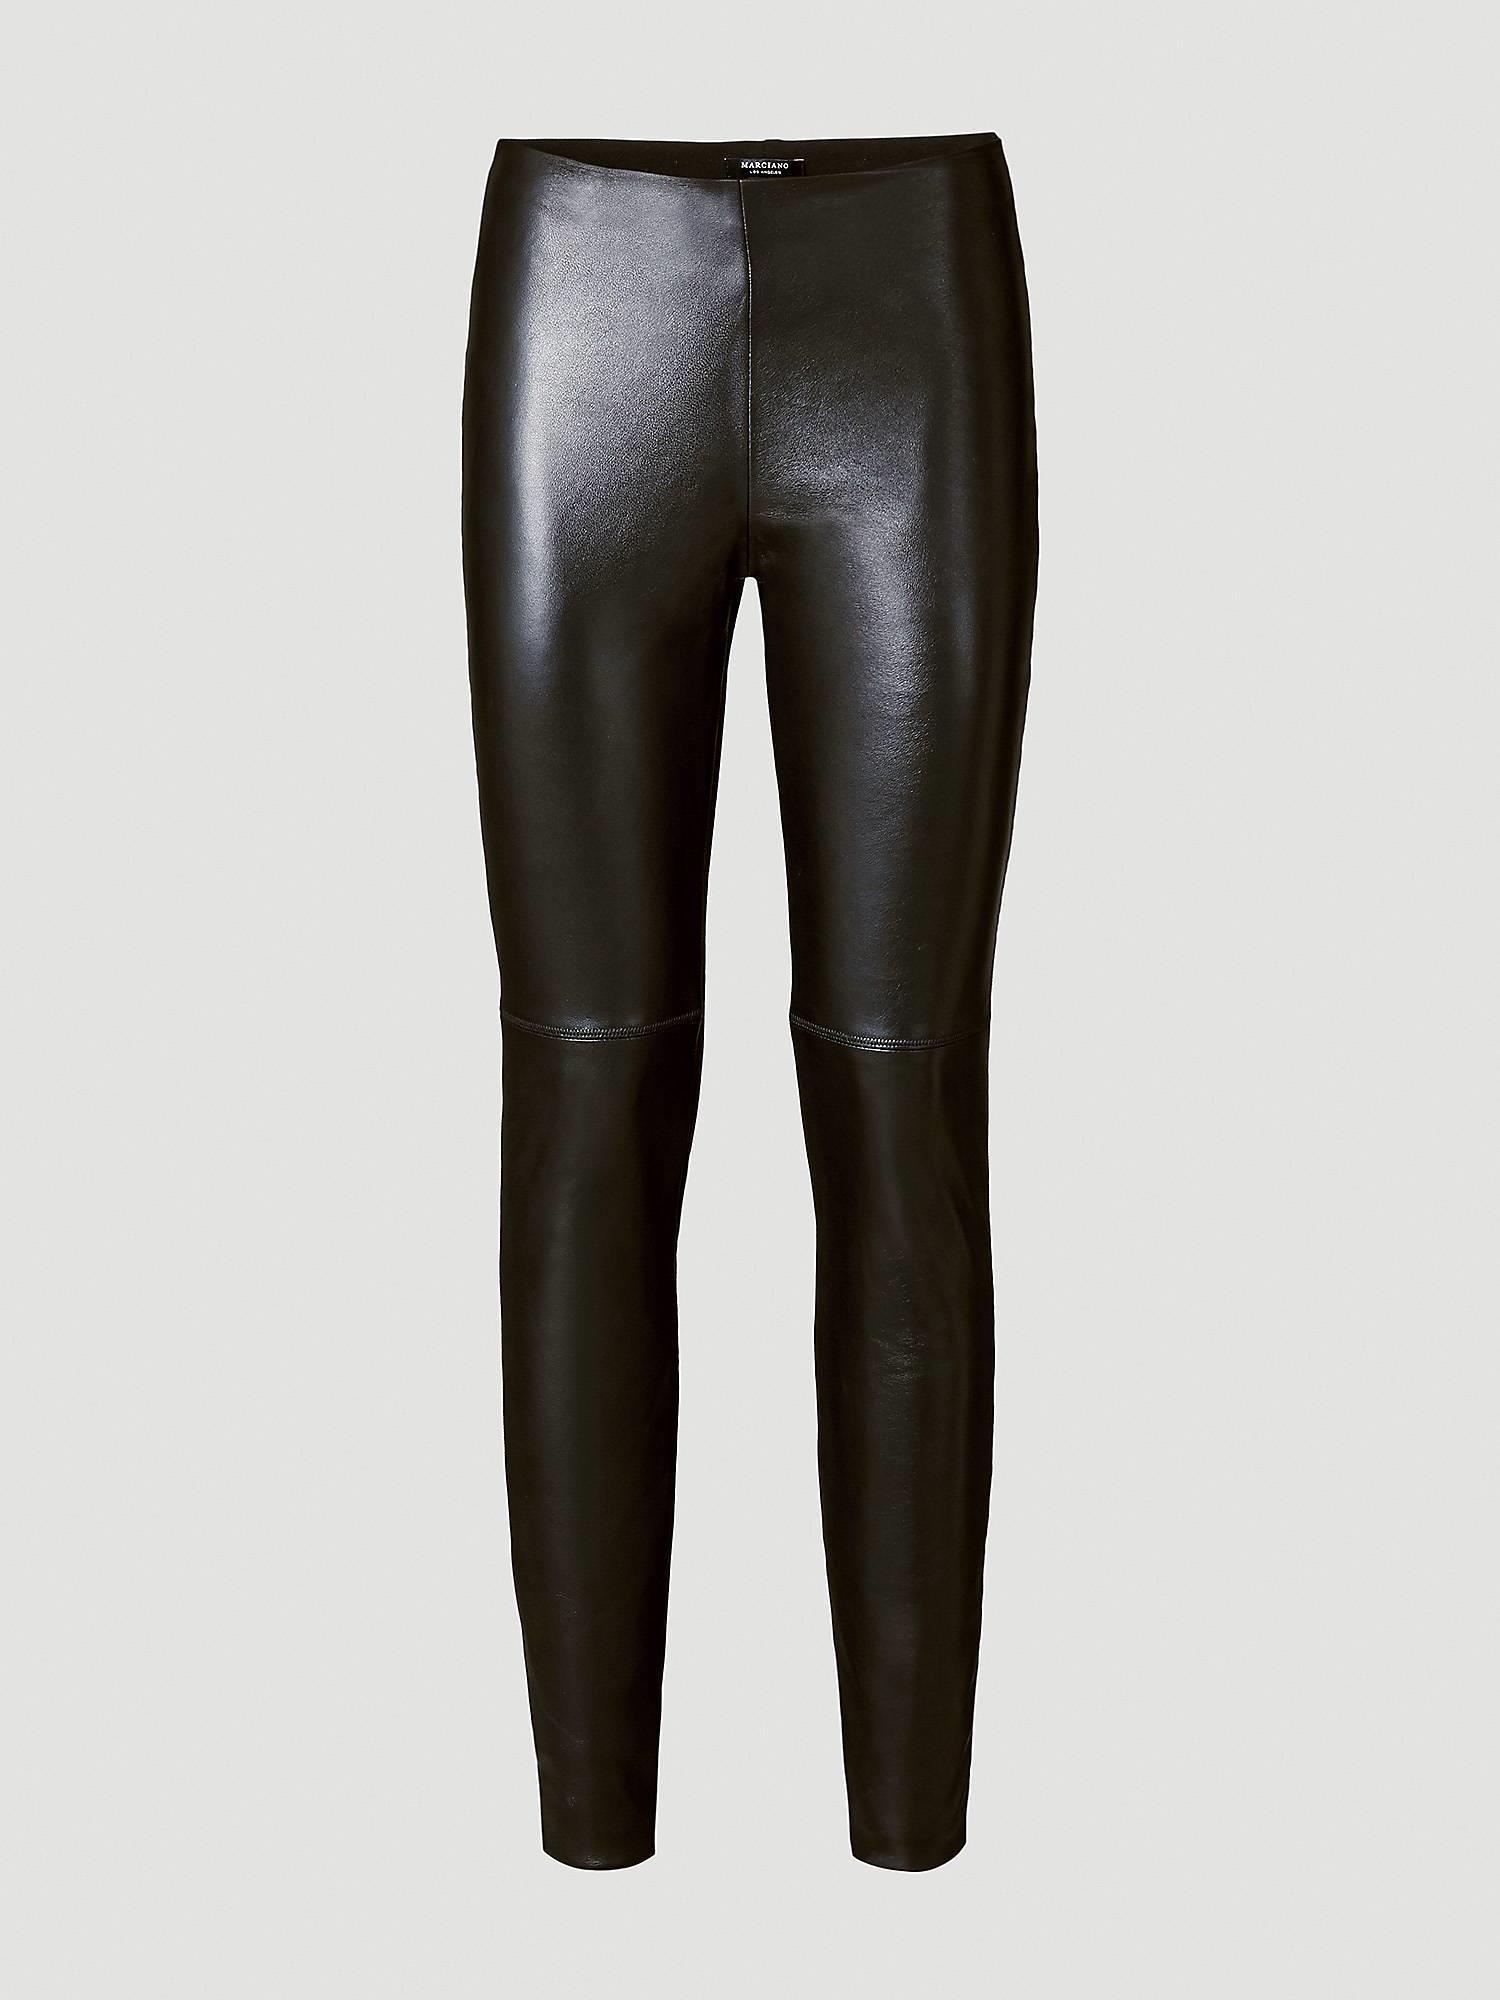 Pantalon Cuero Mujer Moda Primavera 2019